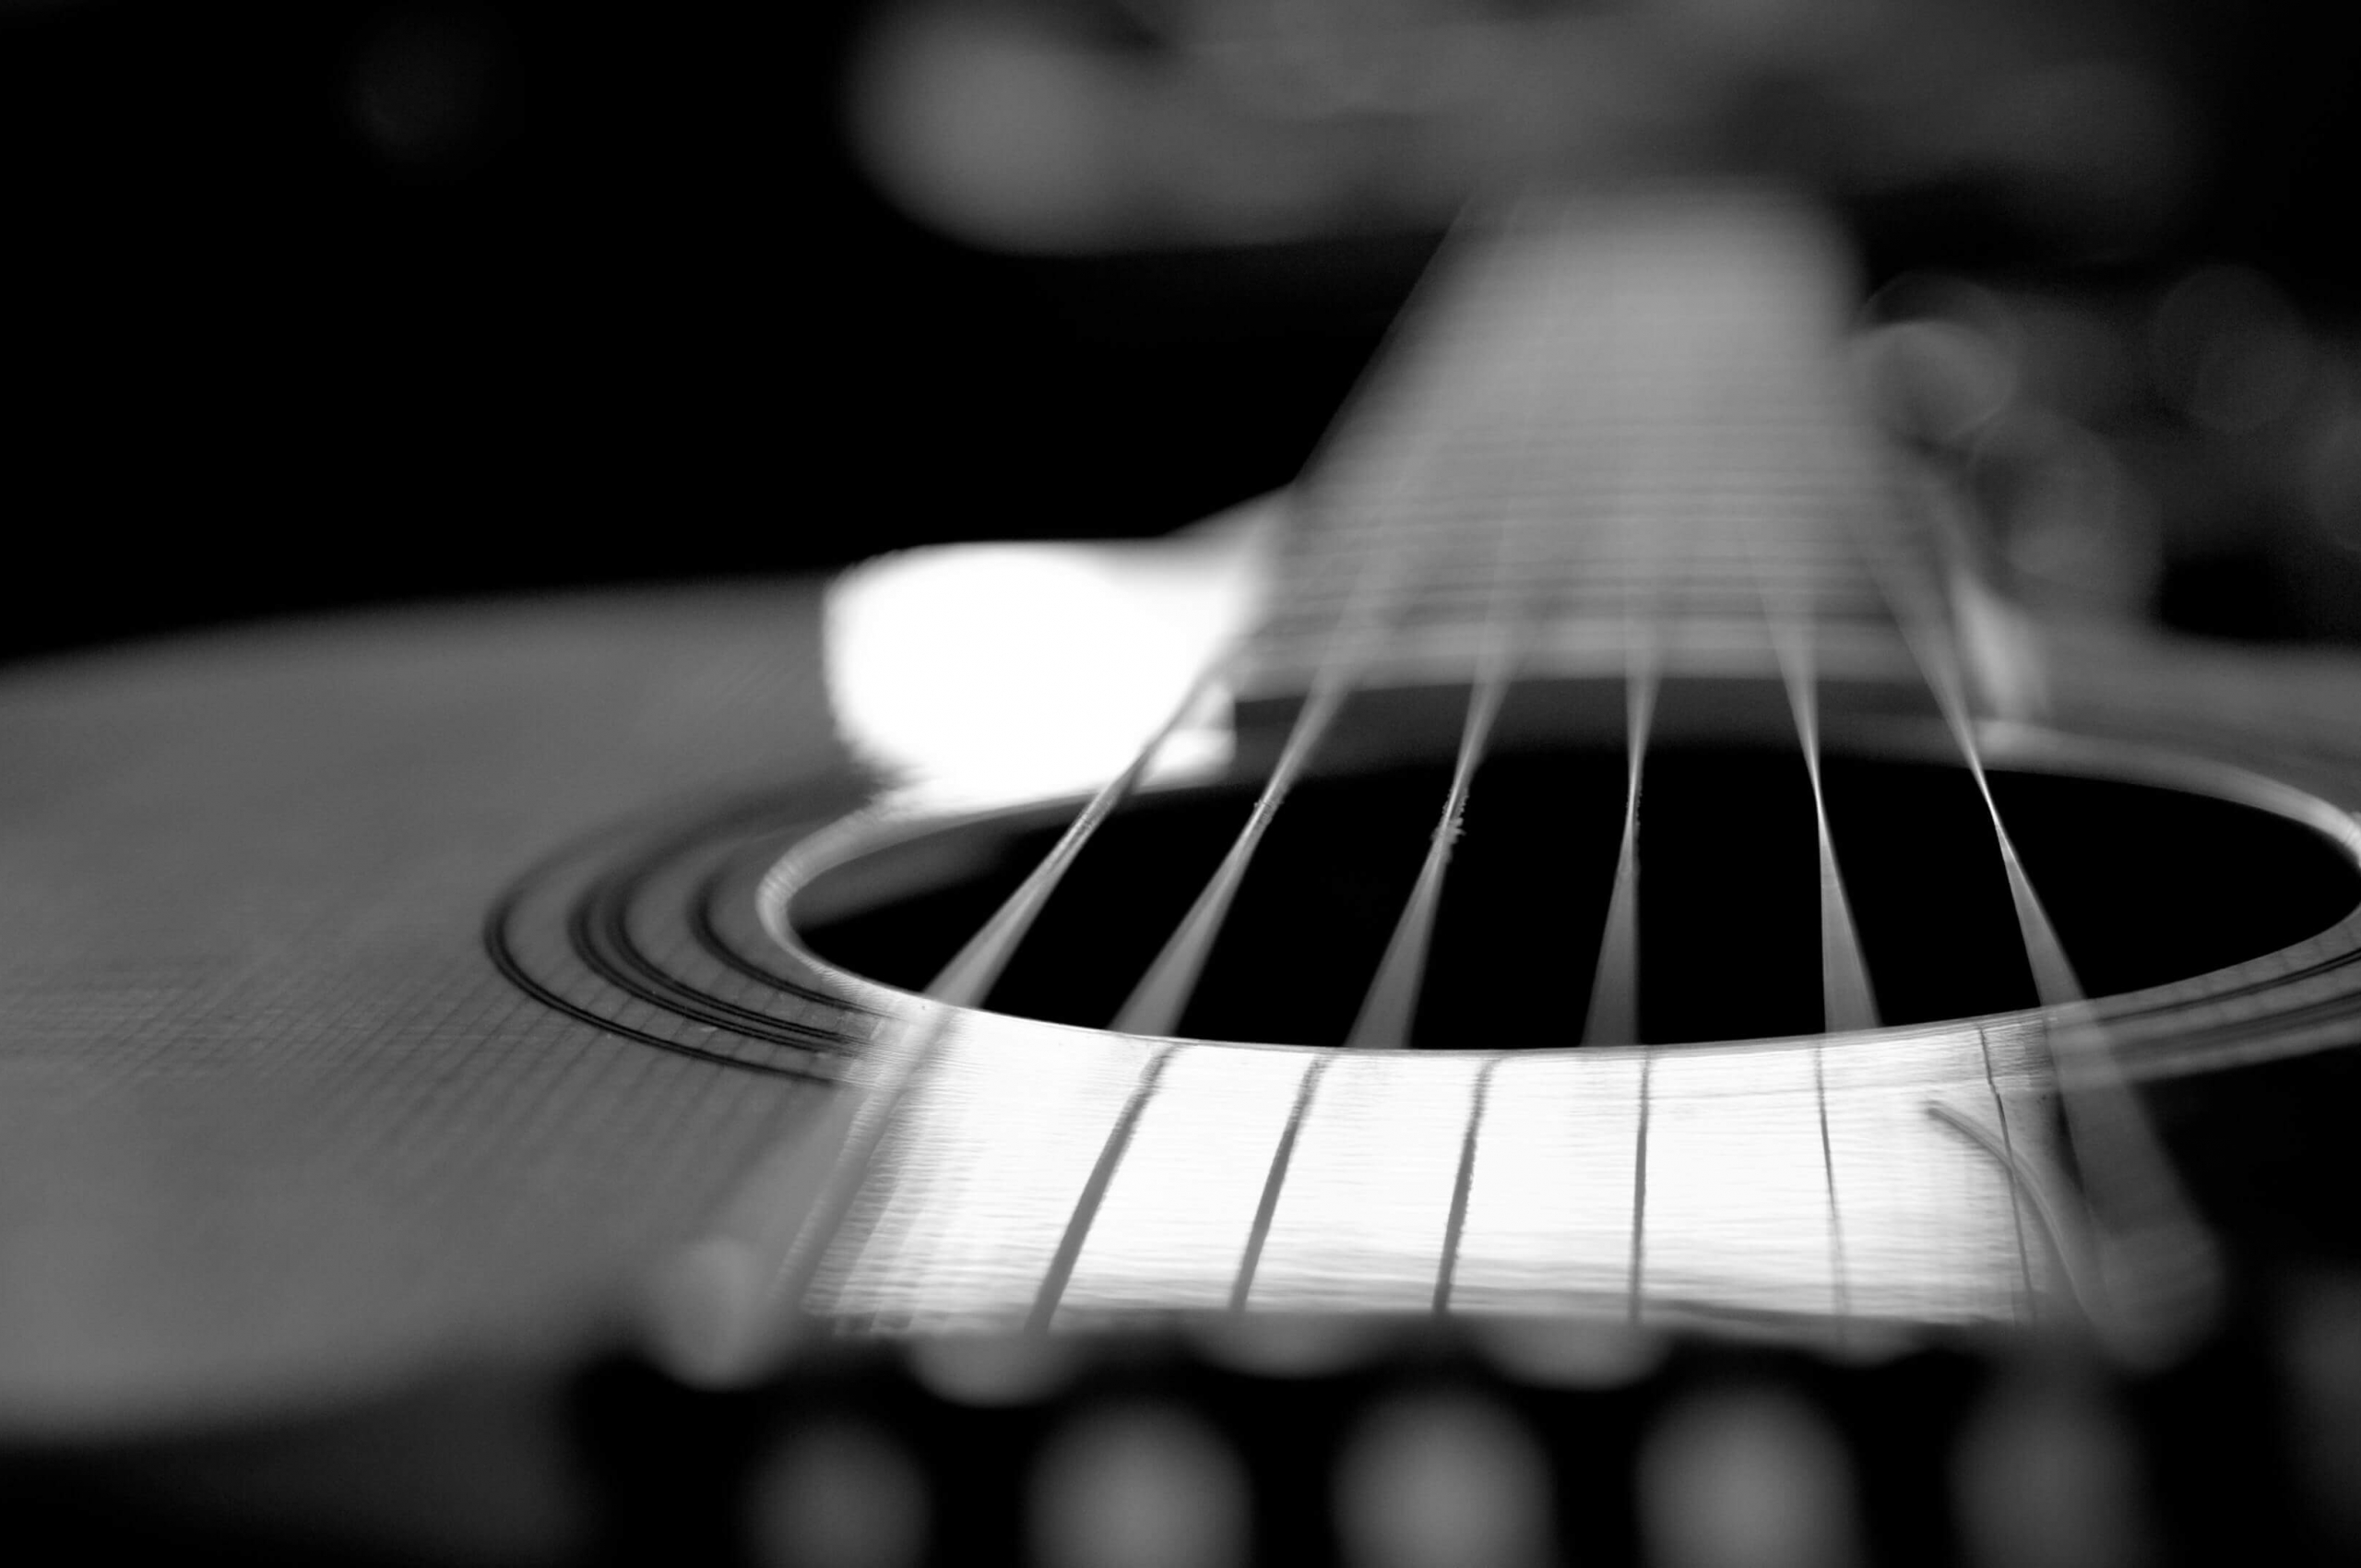 Free Download Taylor 414 Rce Acoustic Guitar Strings 4k Wallpaper 3840x2160 For Your Desktop Mobile Tablet Explore 40 Acoustic Guitar Wallpaper High Resolution Hd Guitar Wallpaper Fender Wallpaper High